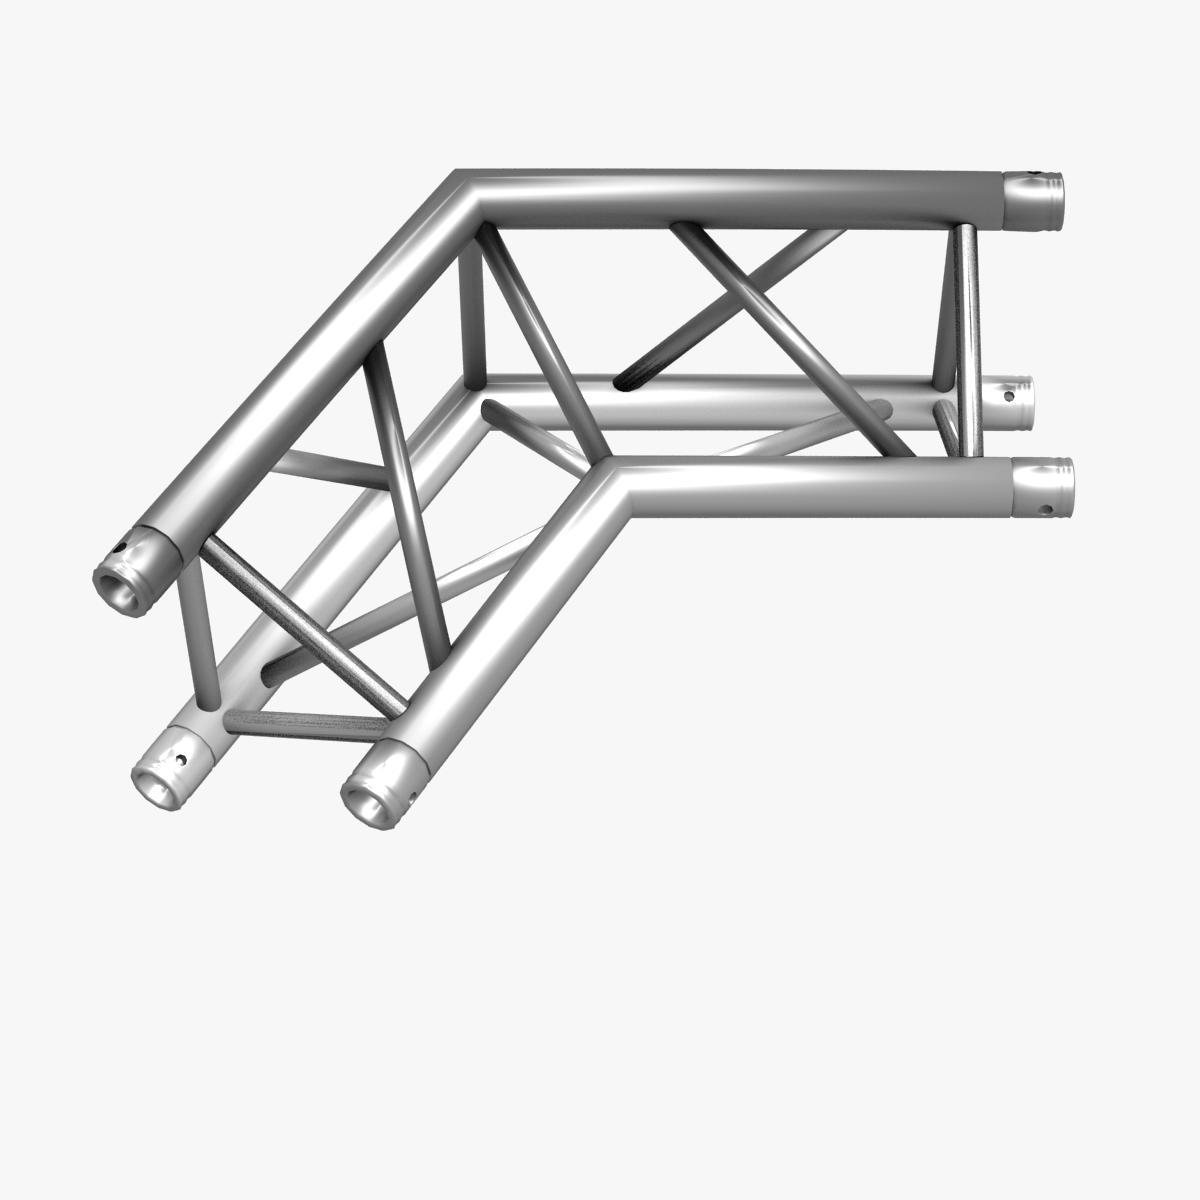 triangular trusses (collection 55 modular pieces) 3d model 3ds max dxf fbx c4d dae texture obj 216247